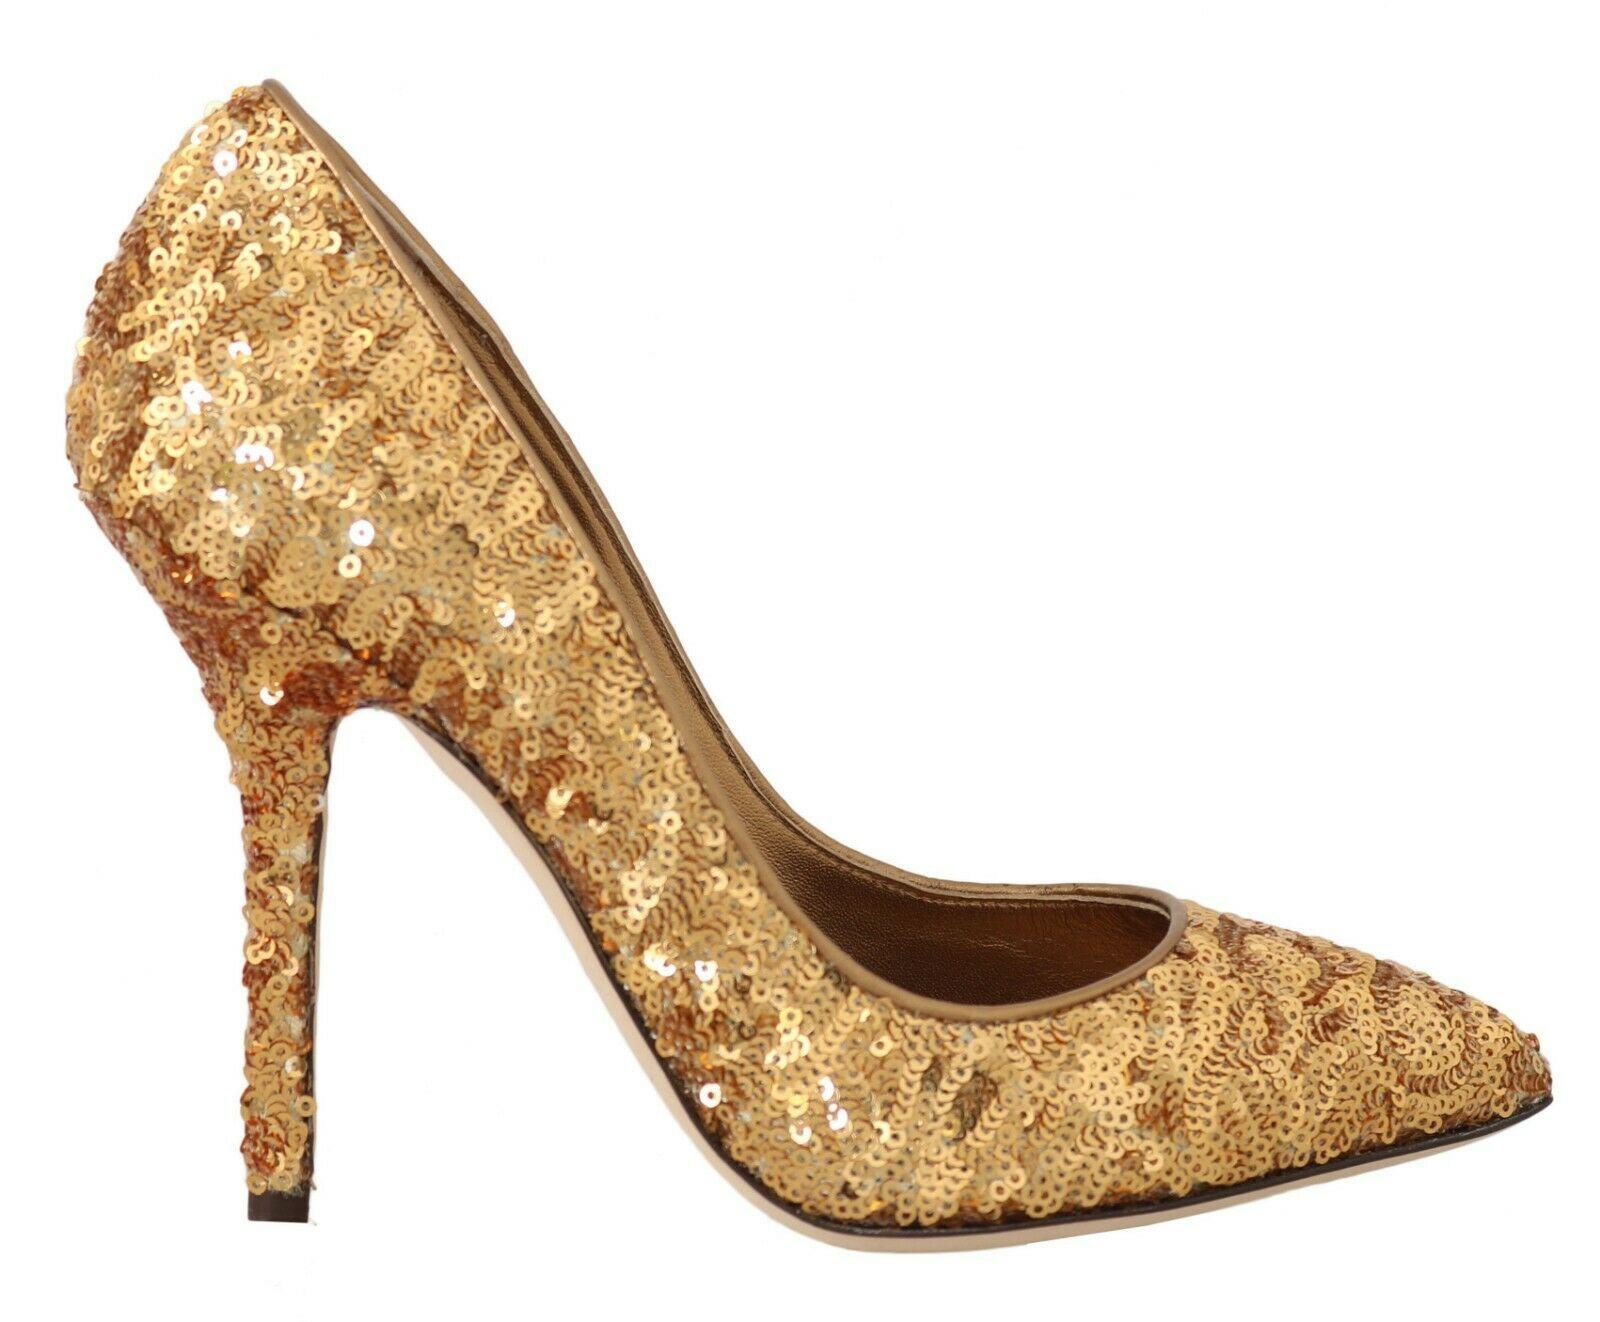 Dolce & Gabbana Women's Sequined Leather Heel Gold LA4469 - EU36/US5.5